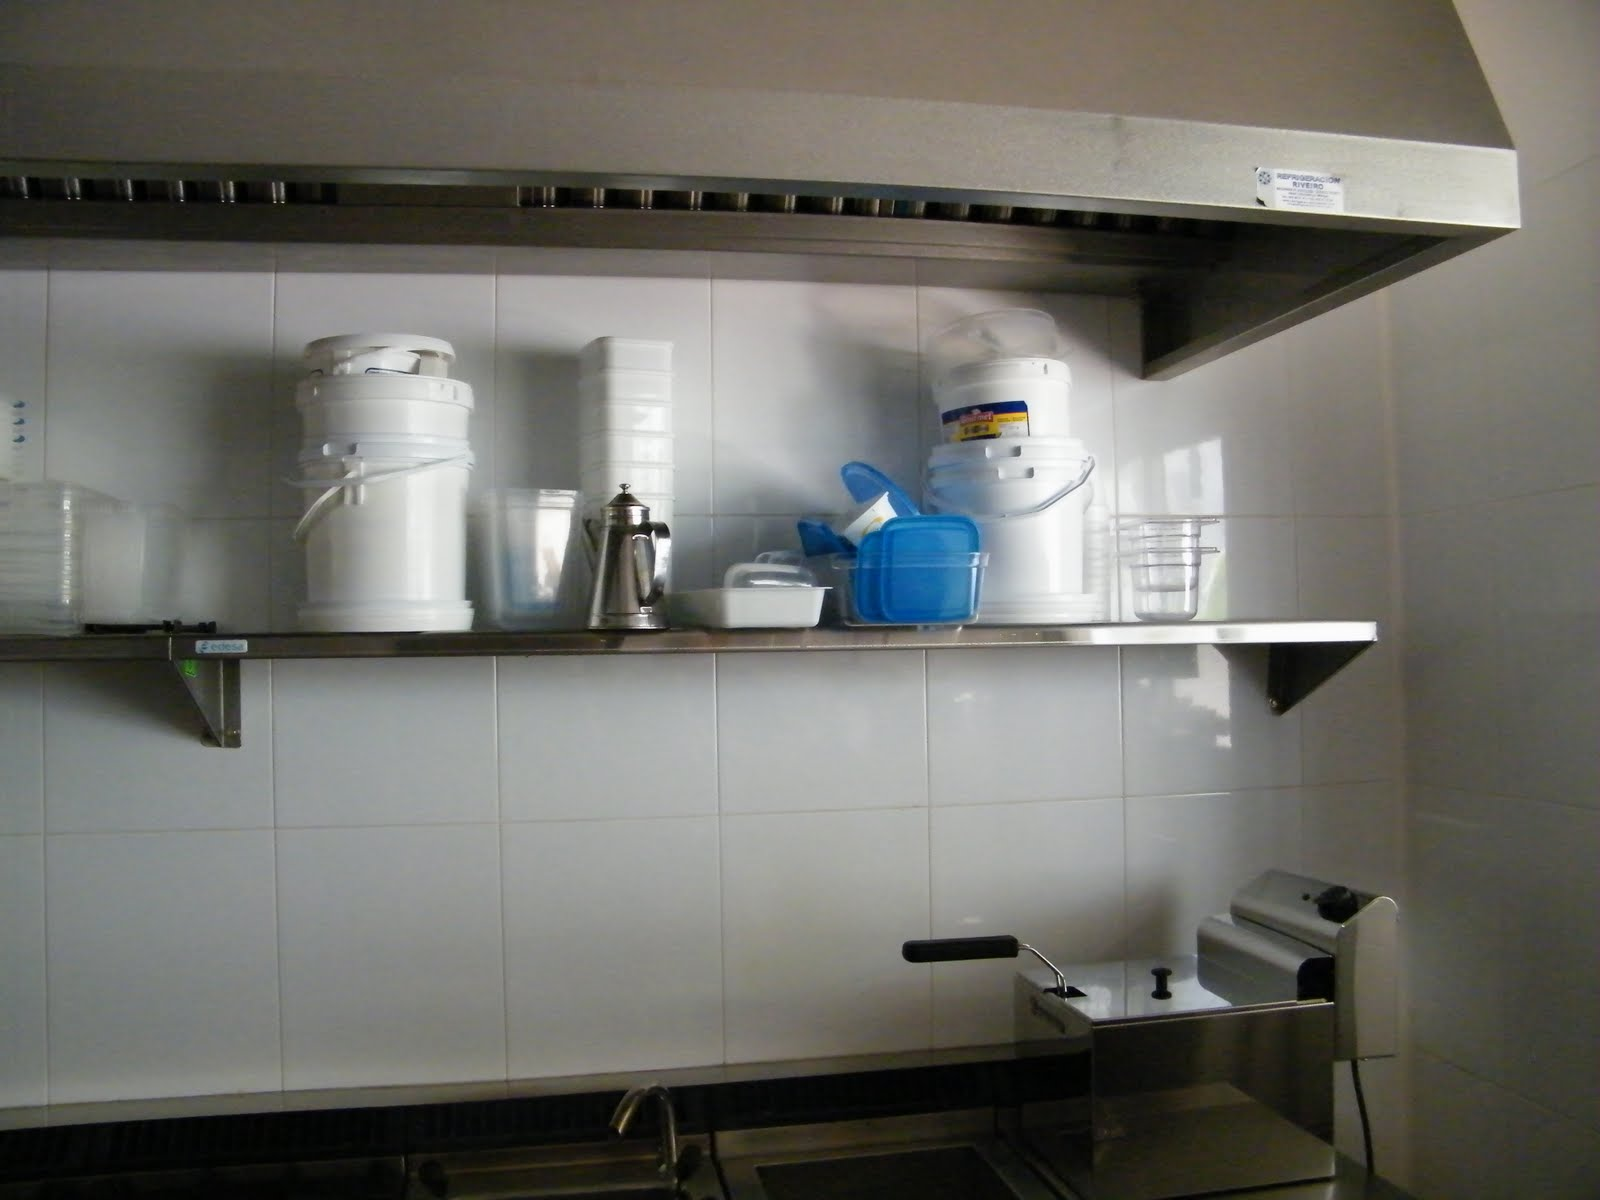 Venta material hosteleria segunda mano estantes de acero for Hosteleria segunda mano